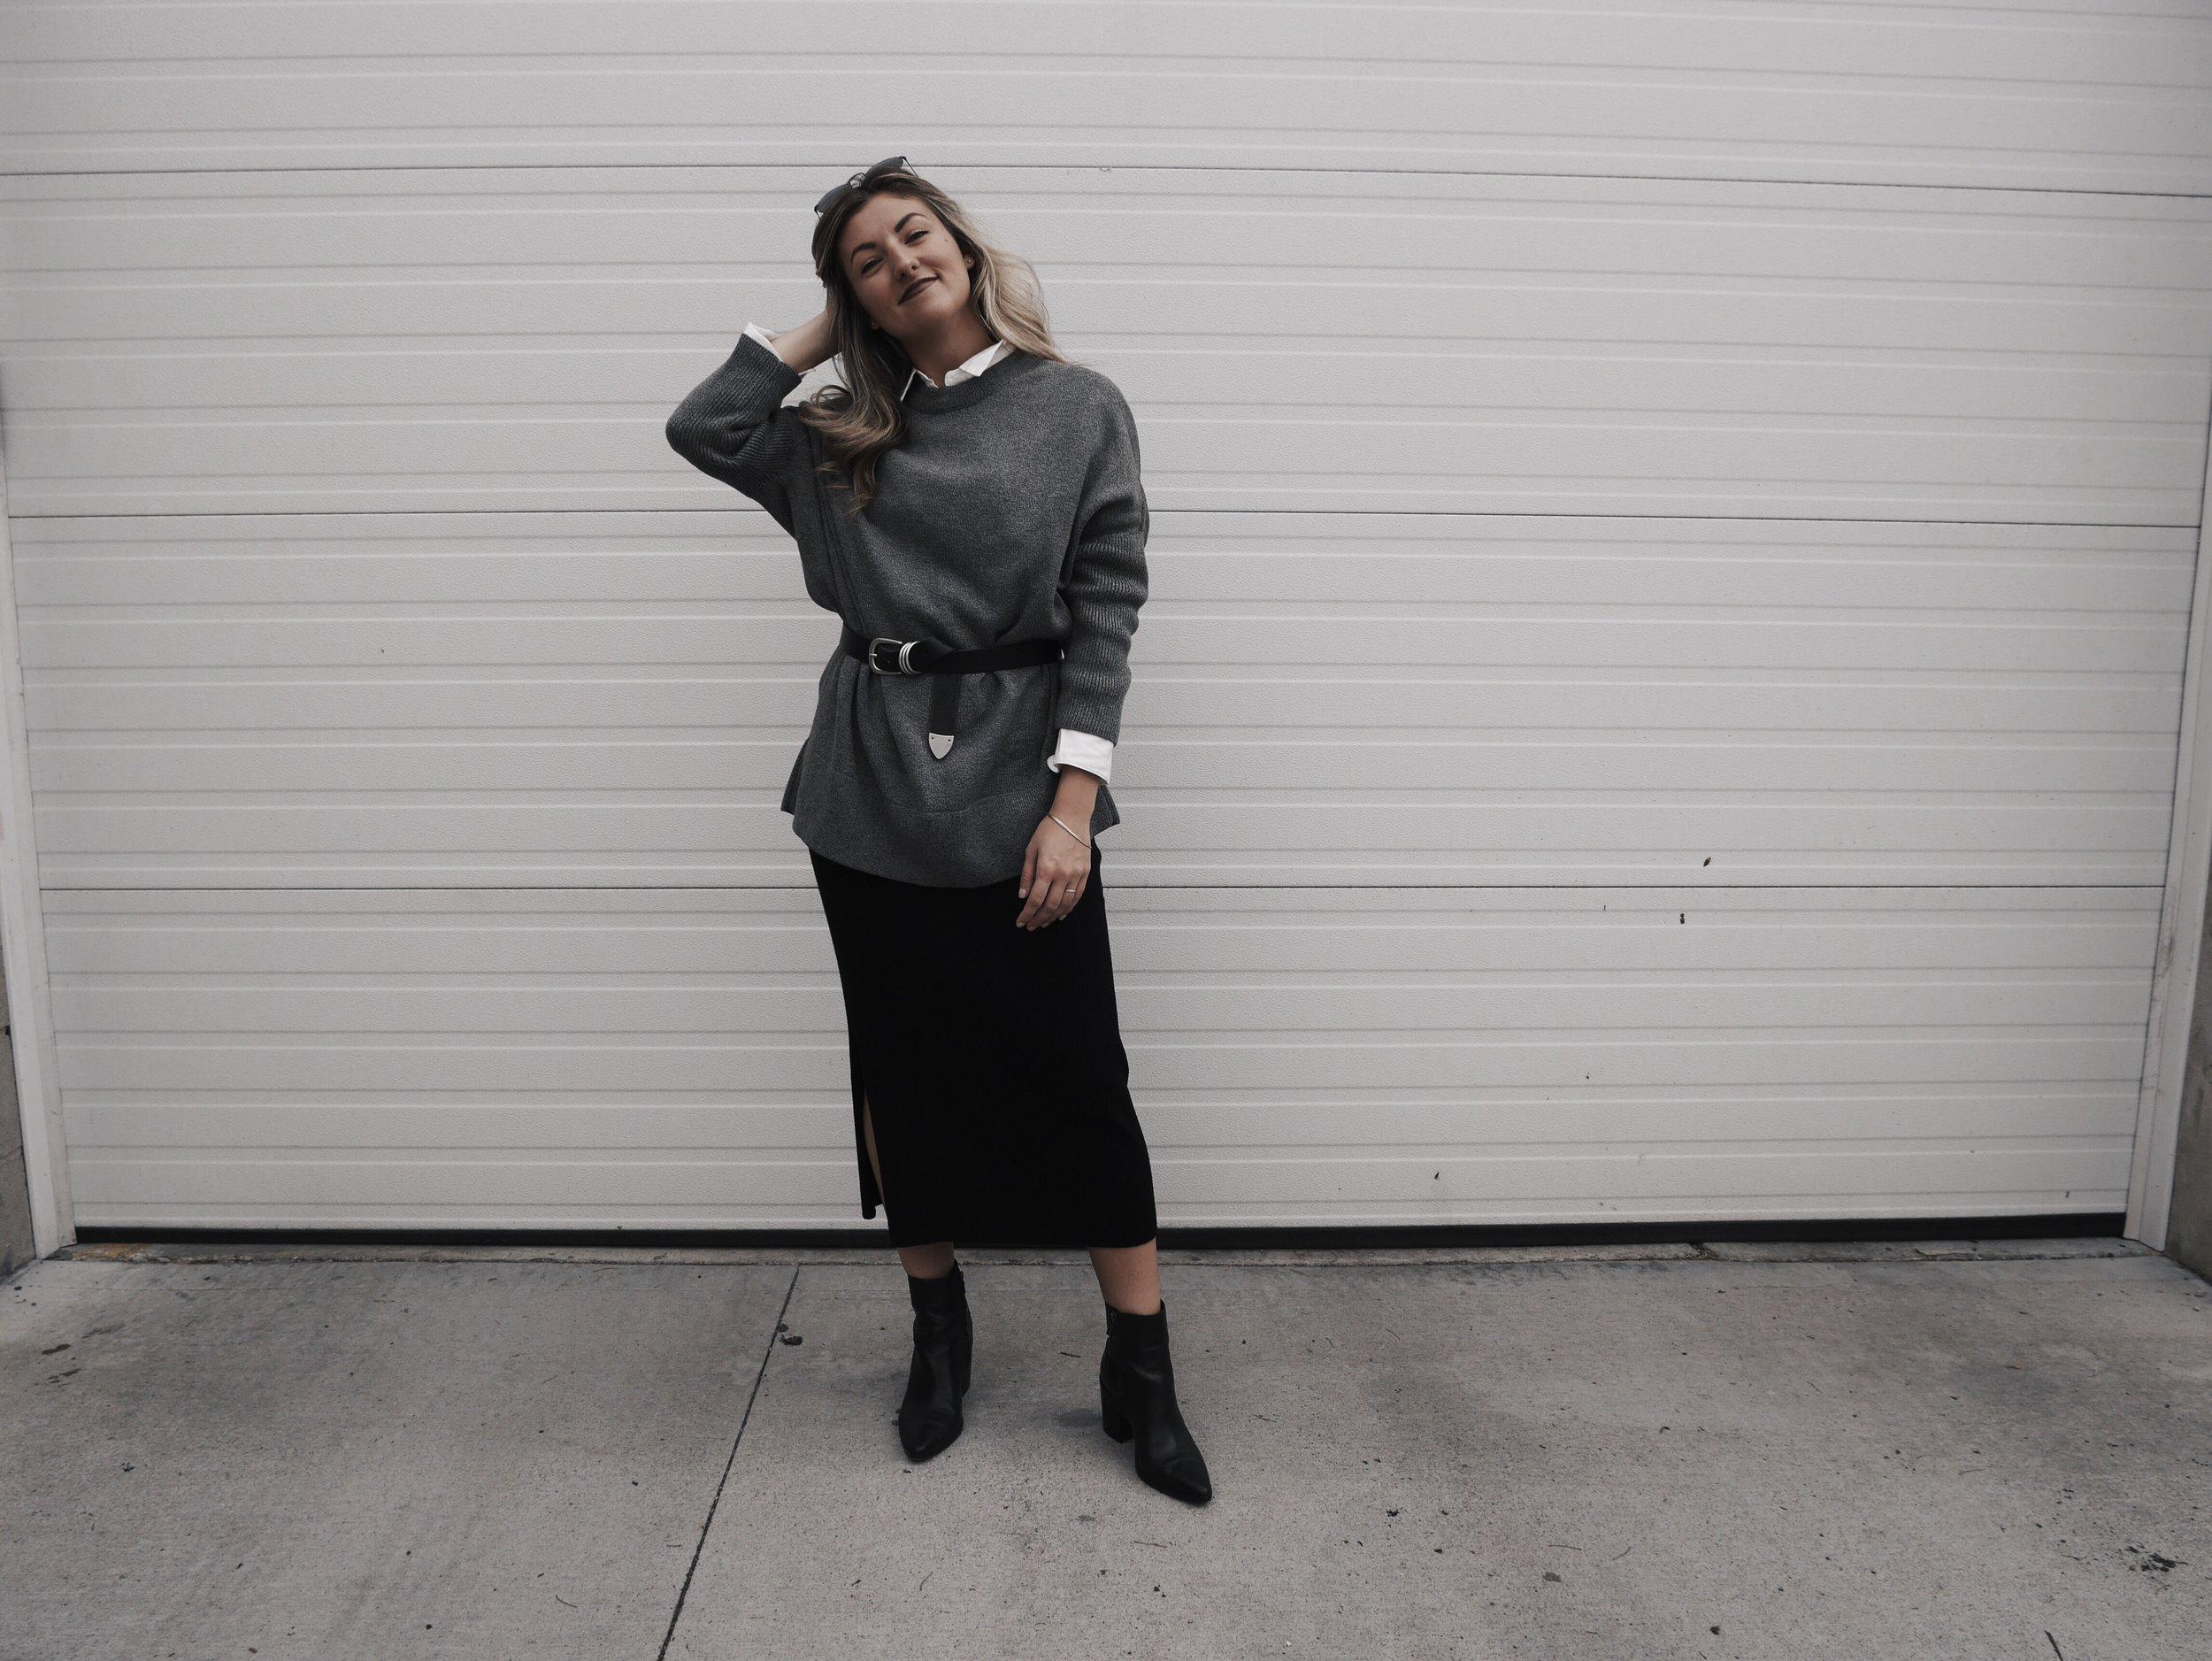 Jessica-Lambi-Vetta-Capsule-Oversized-Sweatr.jpg